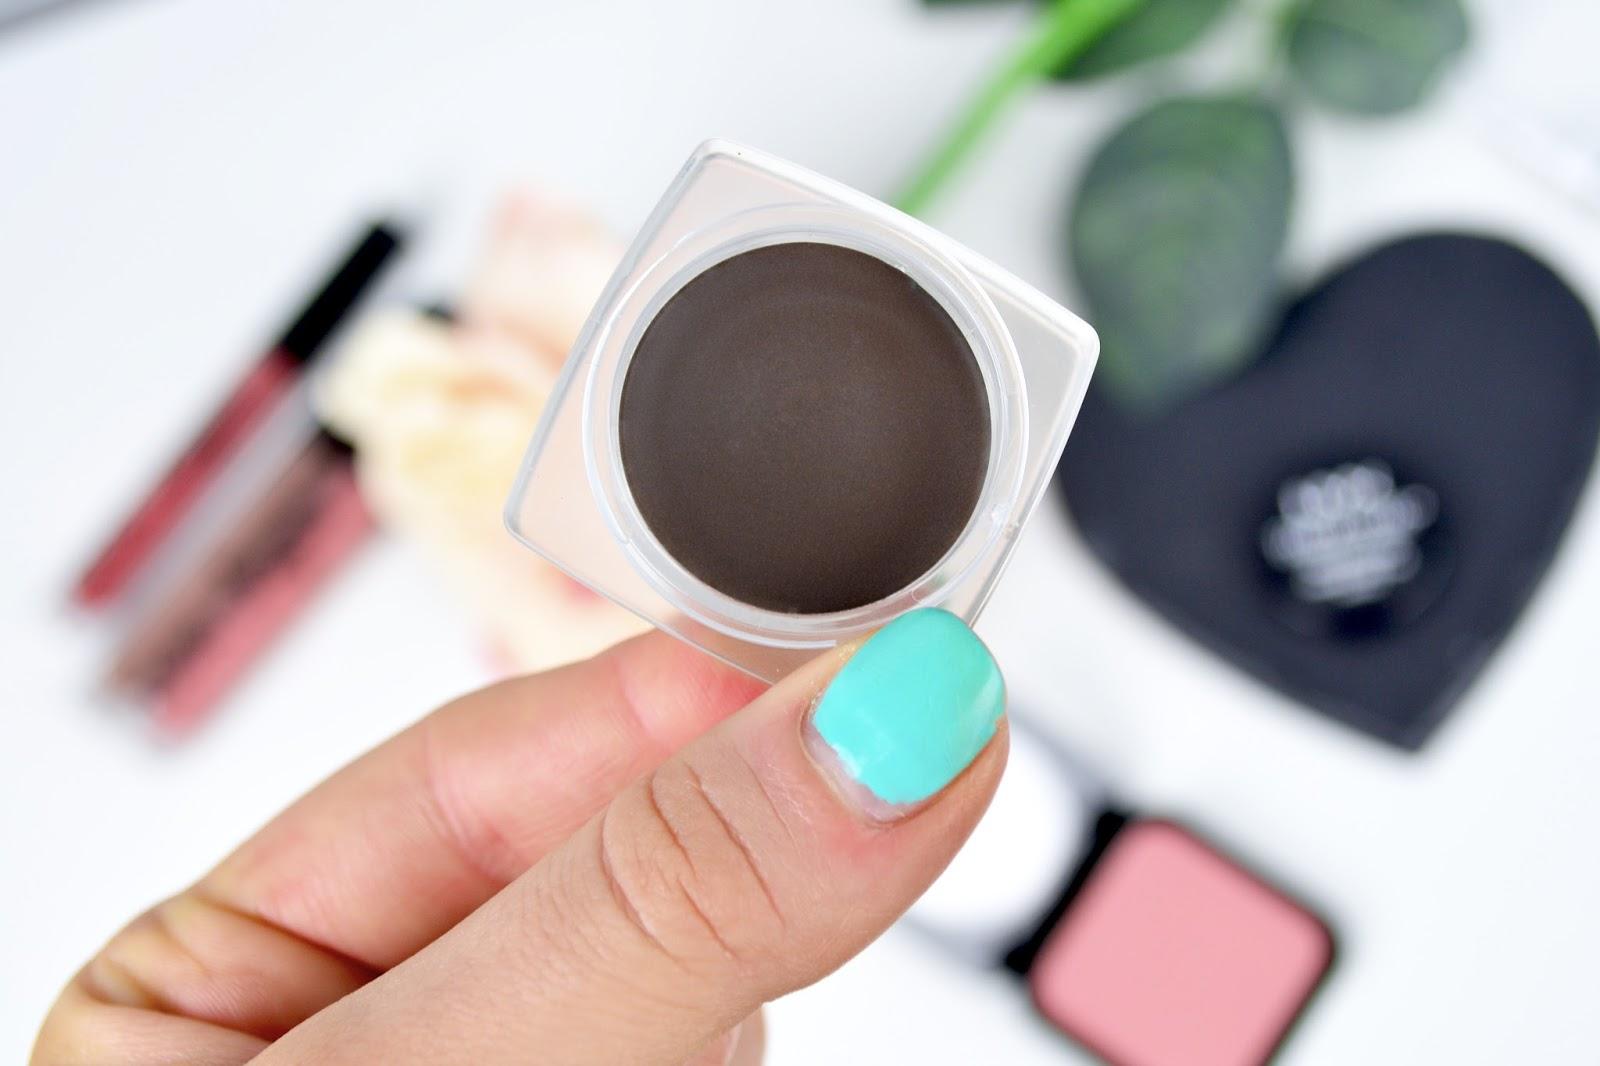 Makeup, NYX, NYX Haul, NYX Lip Lingeire, NYX HD Blush, NYX Tame and Frame Brow Pomade, Brows, Matte Lipstick,